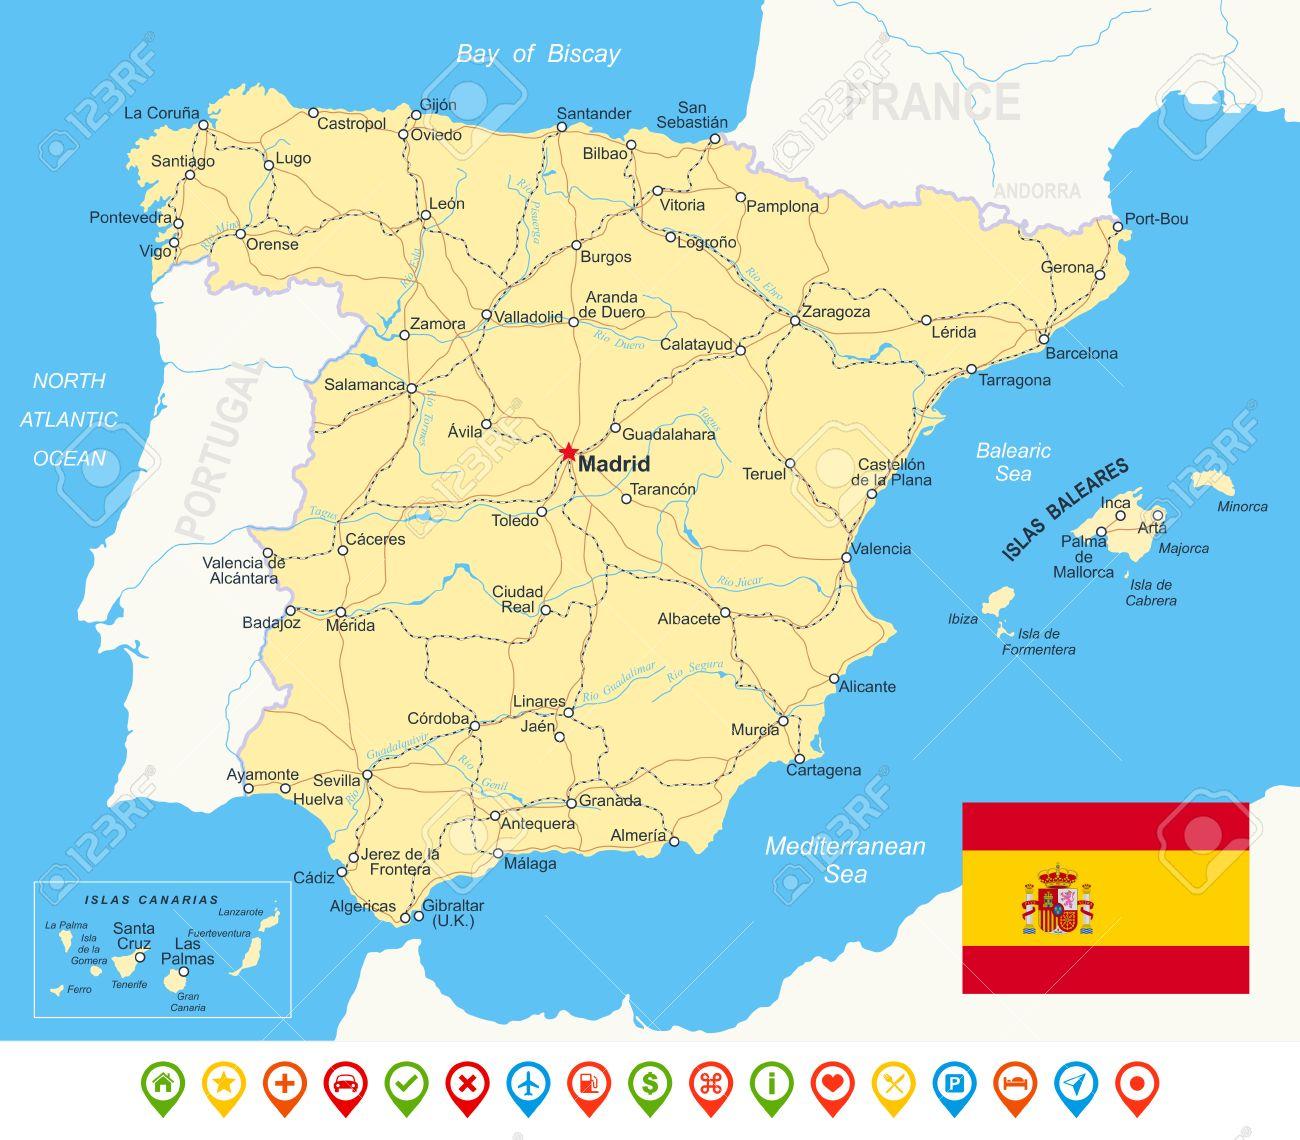 Spanische Karte.Stock Photo